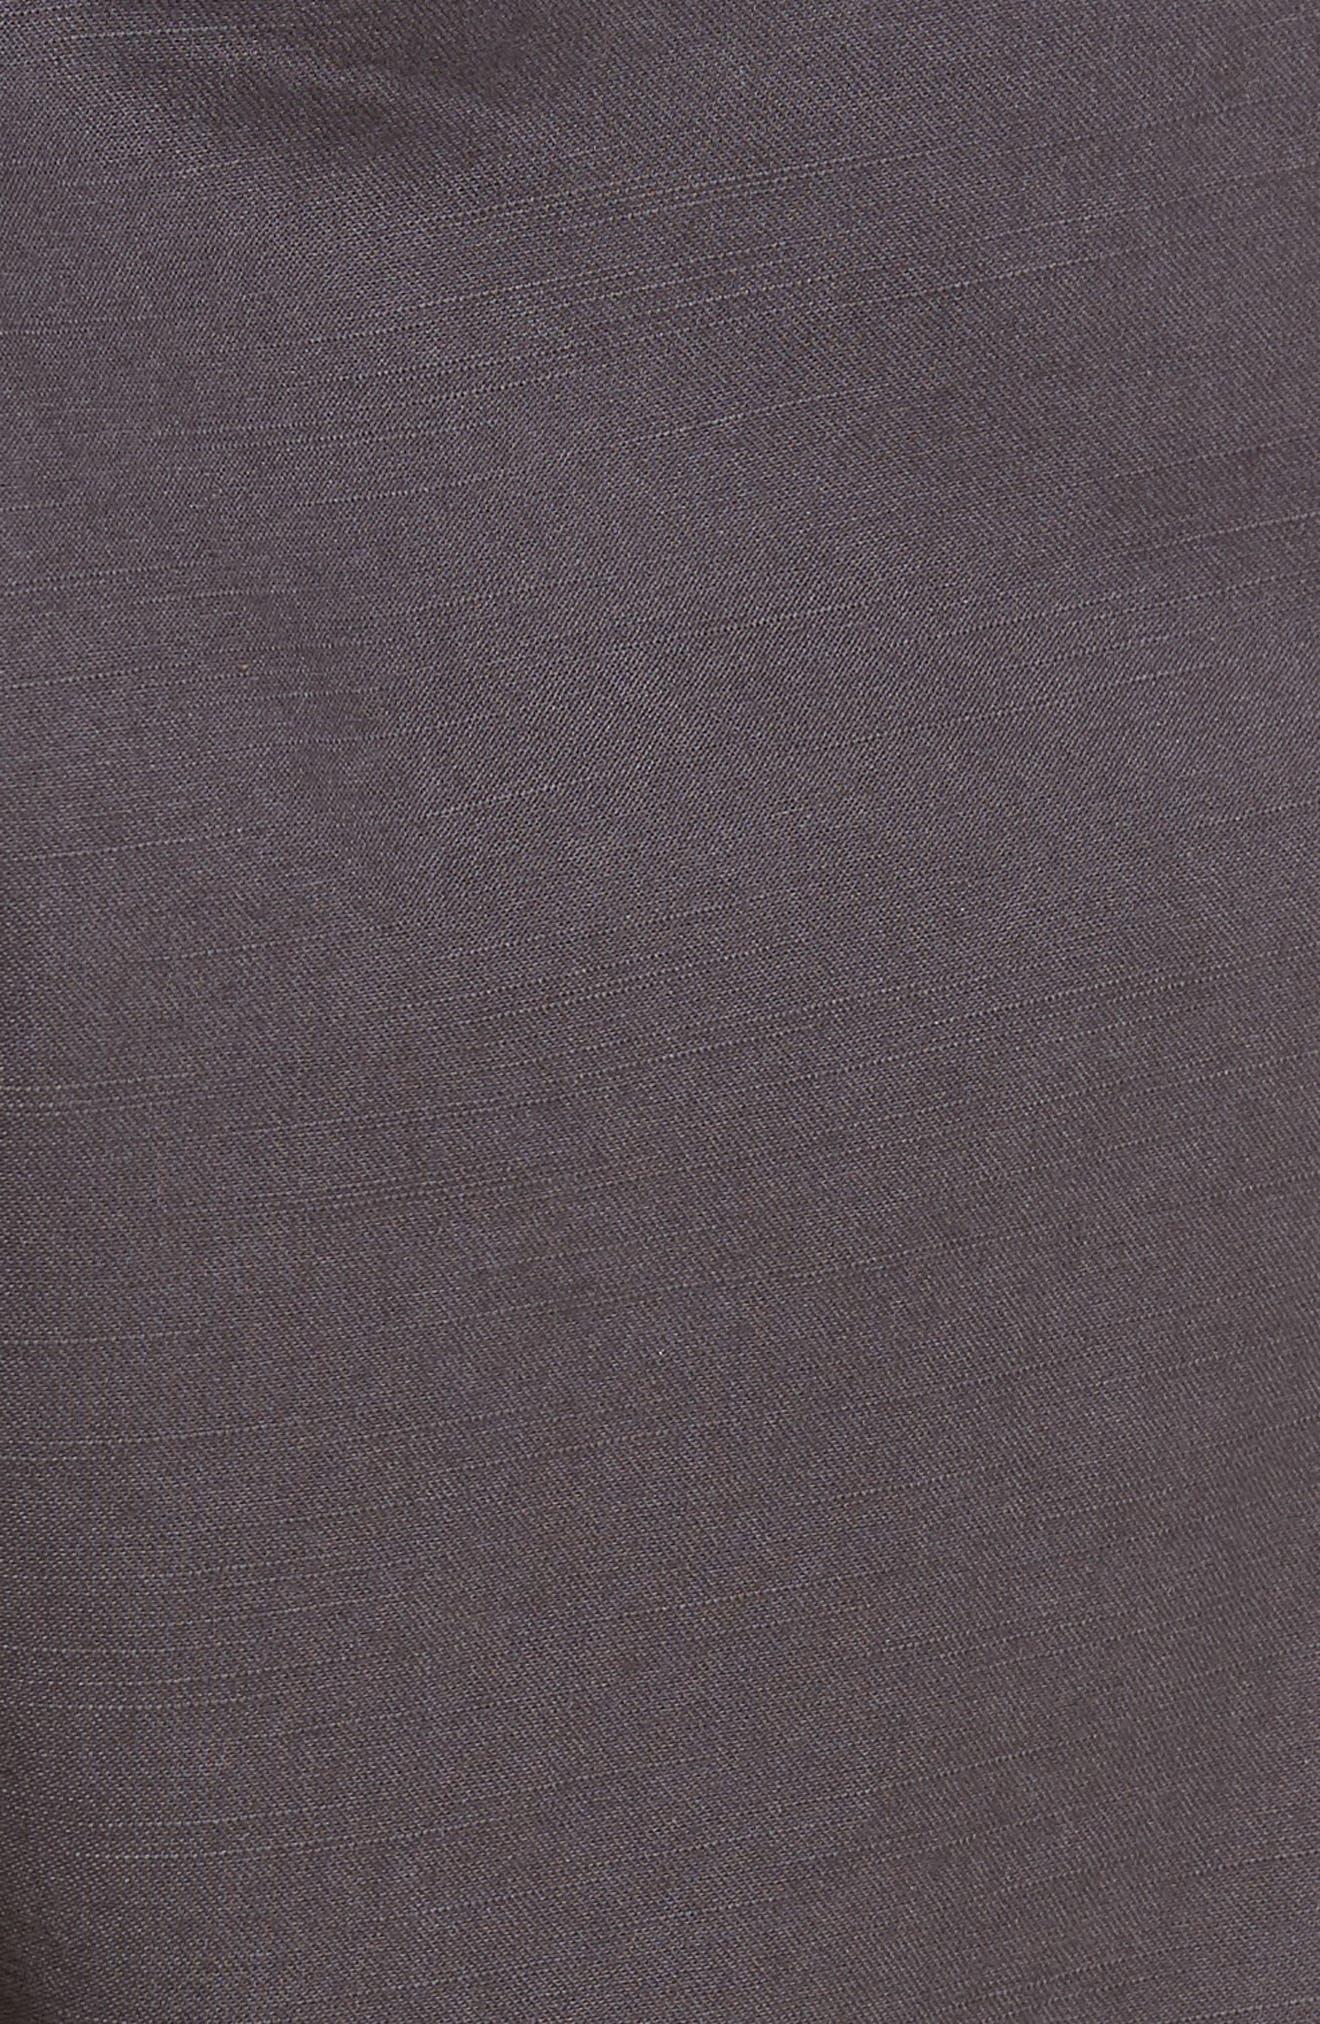 E-Waist Utility Shorts,                             Alternate thumbnail 5, color,                             021